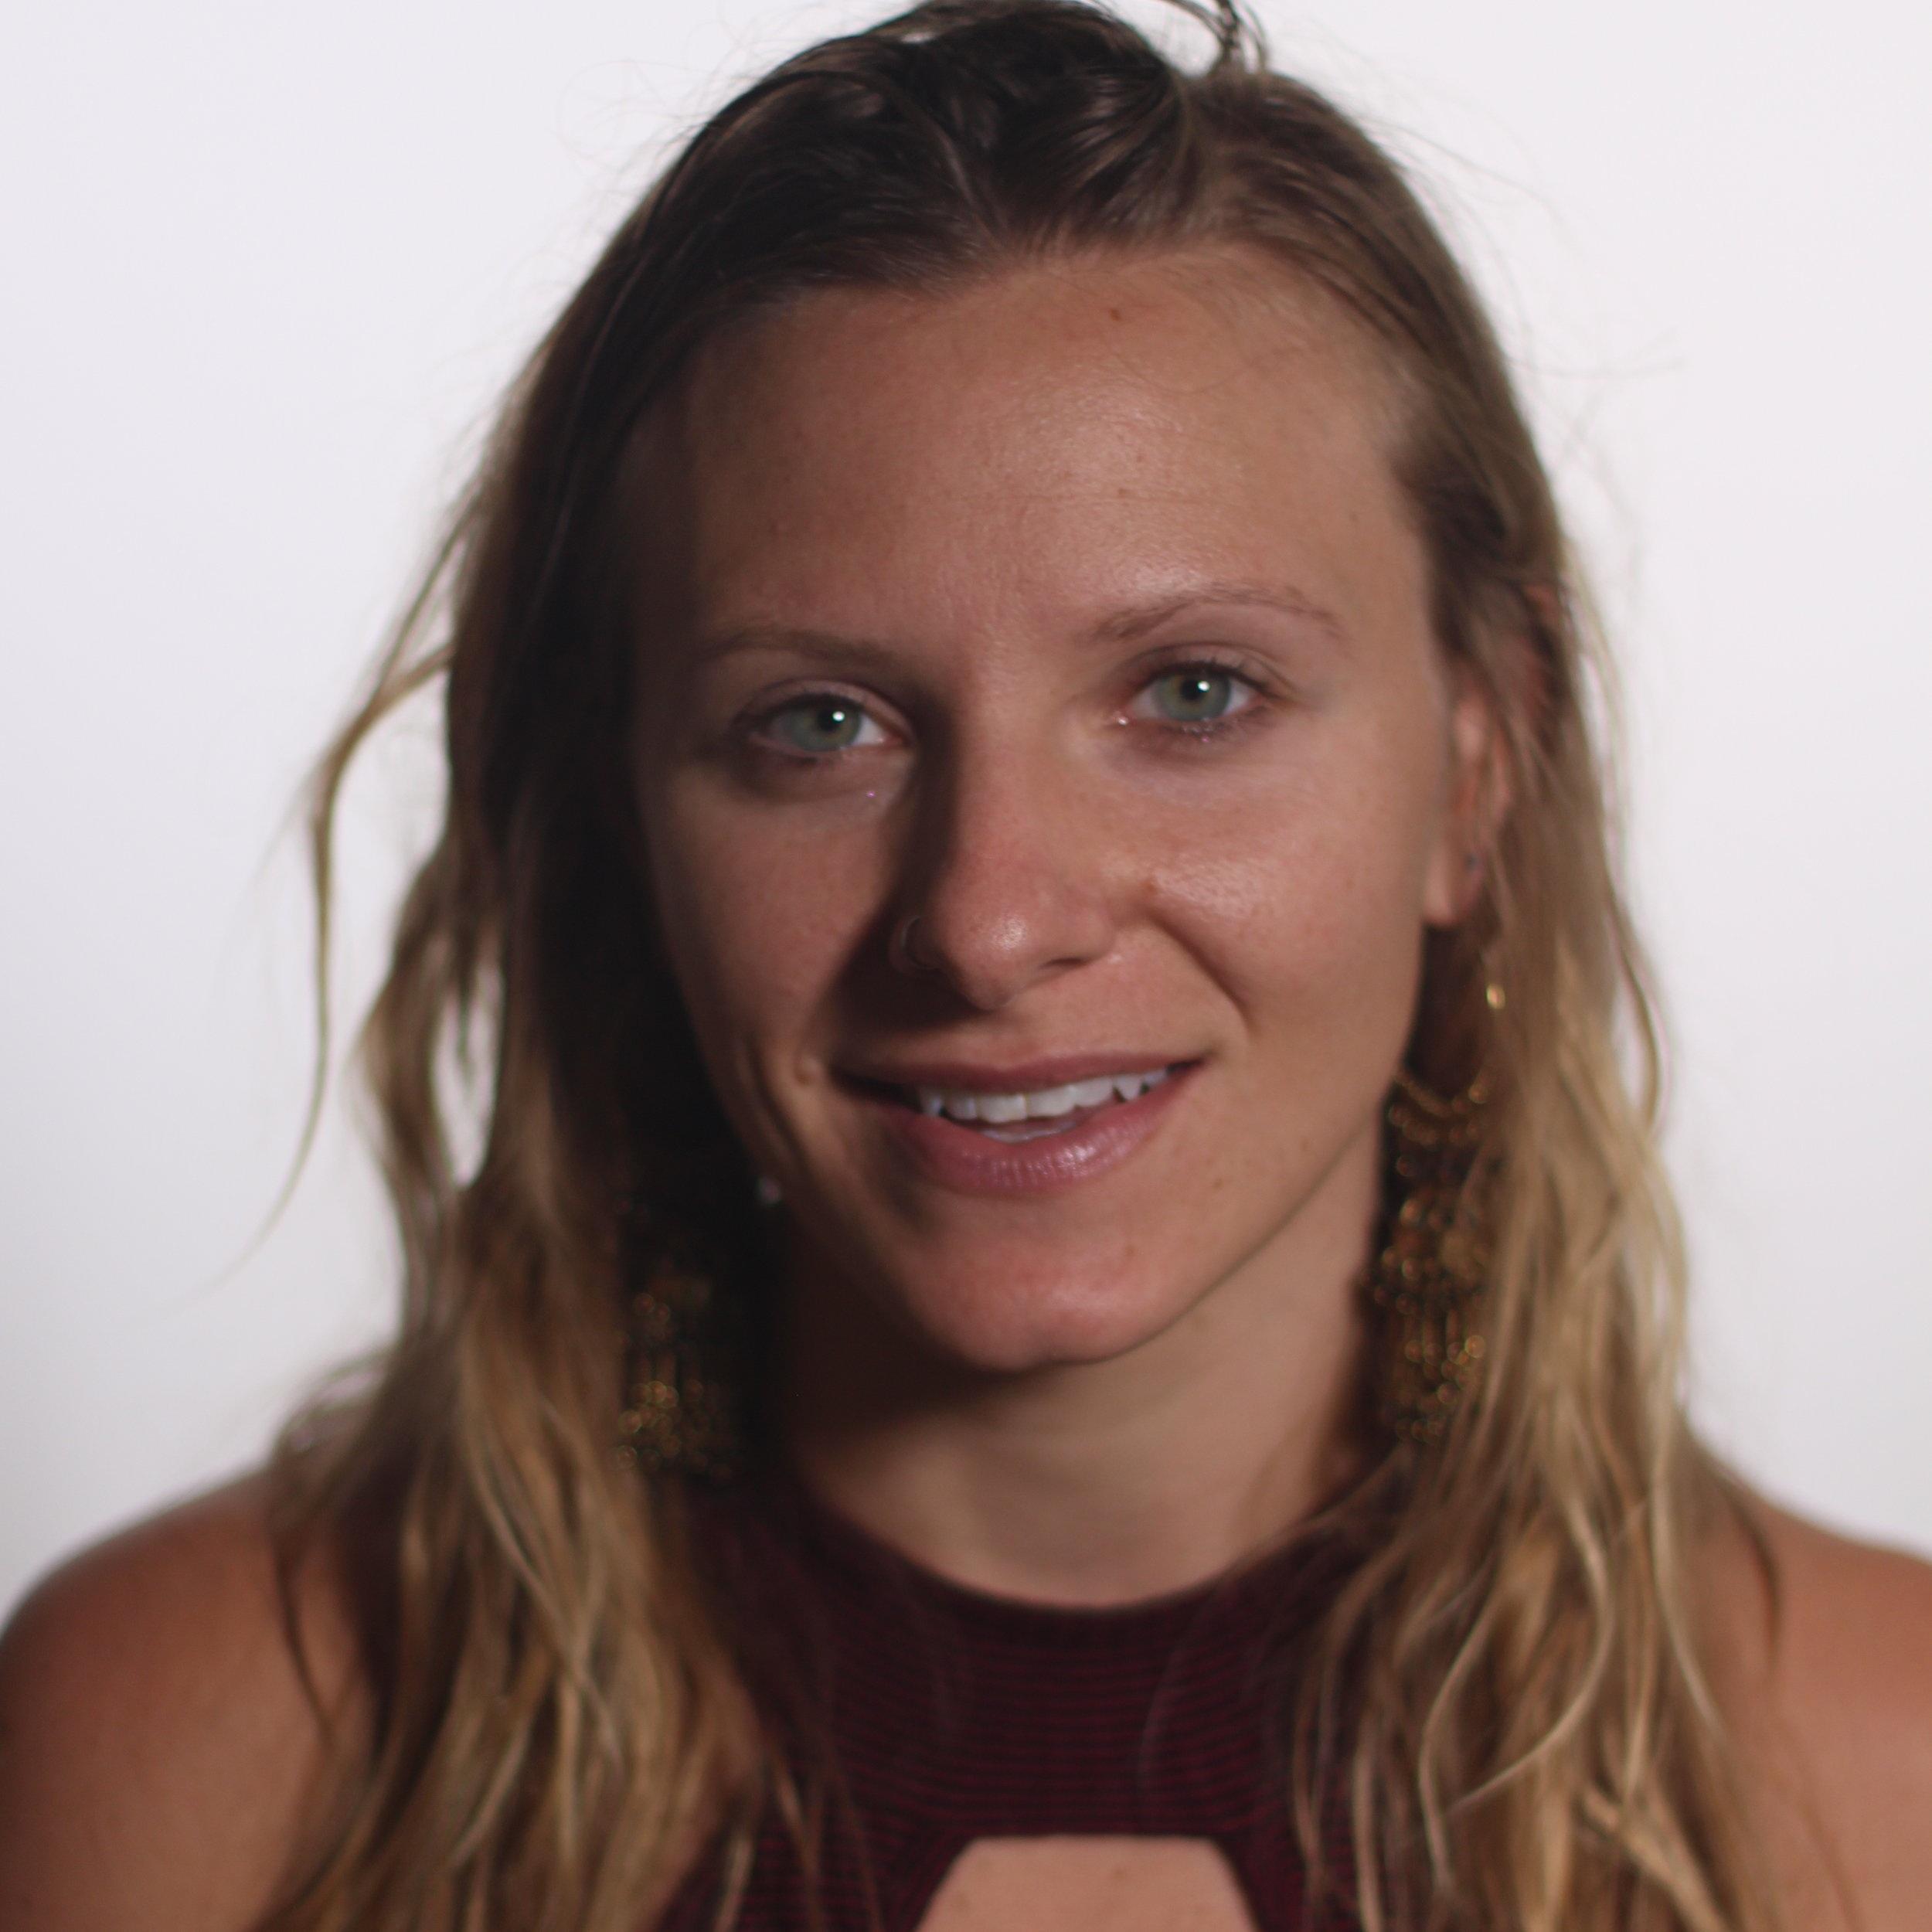 Shannon Cummings